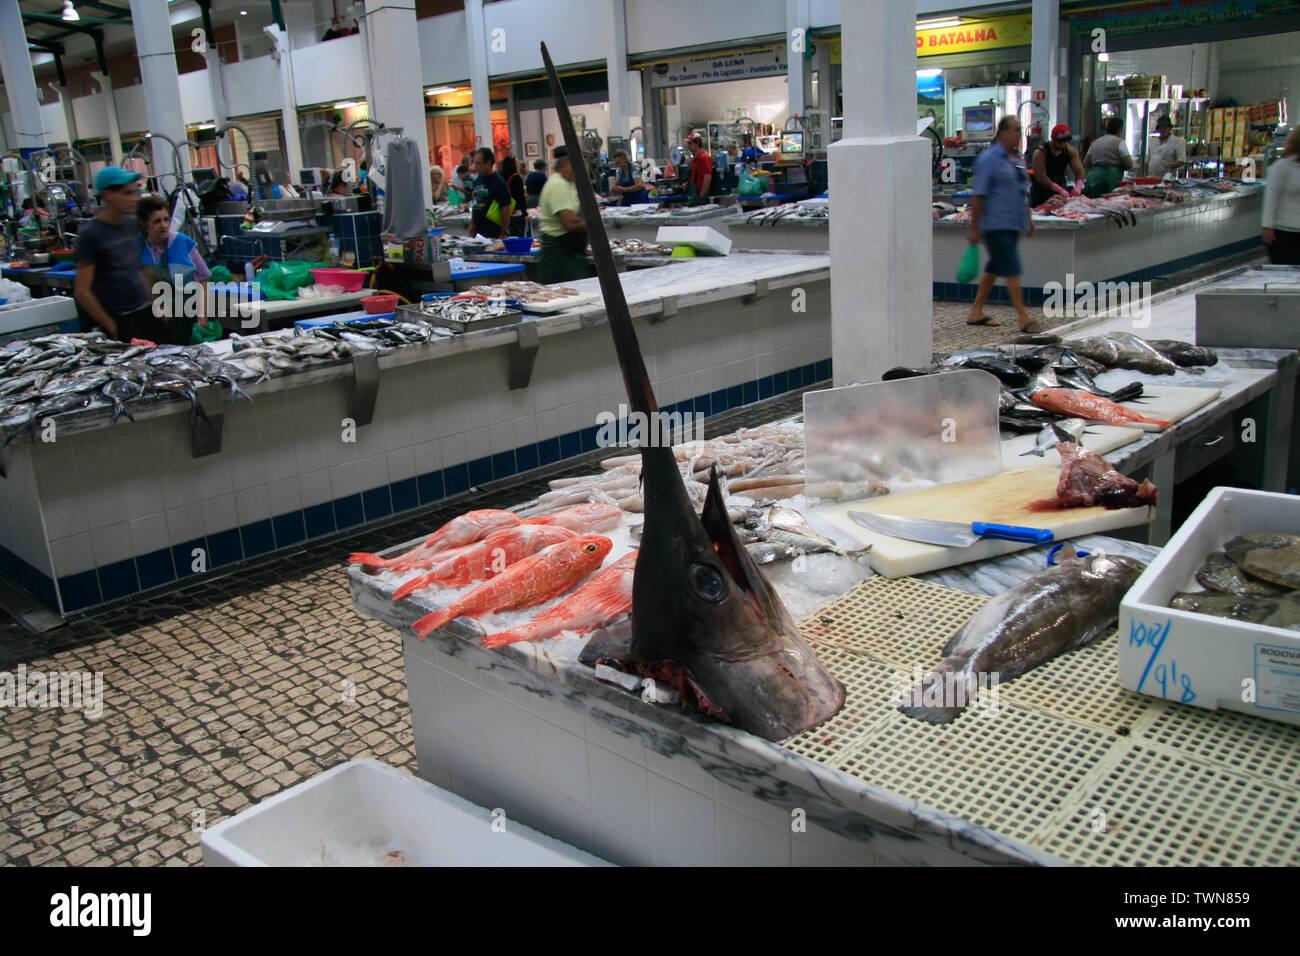 dead fish on the fish market - Stock Image